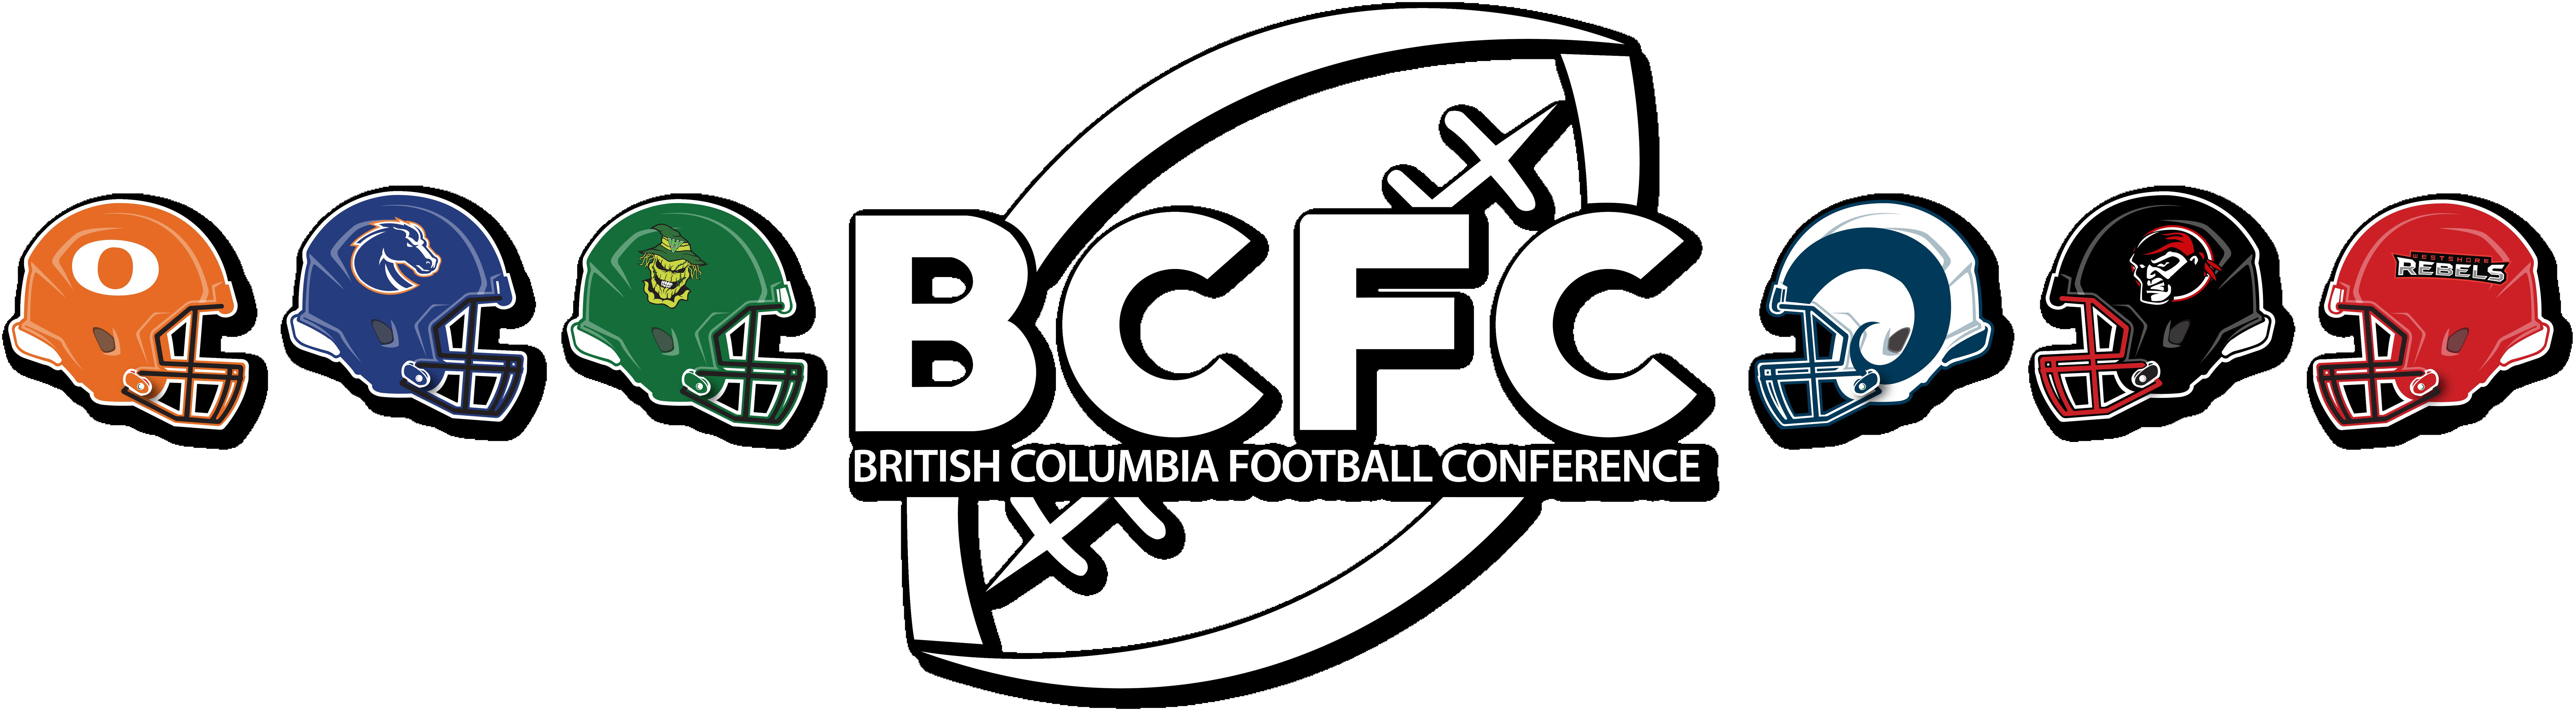 Bcfc website main banner